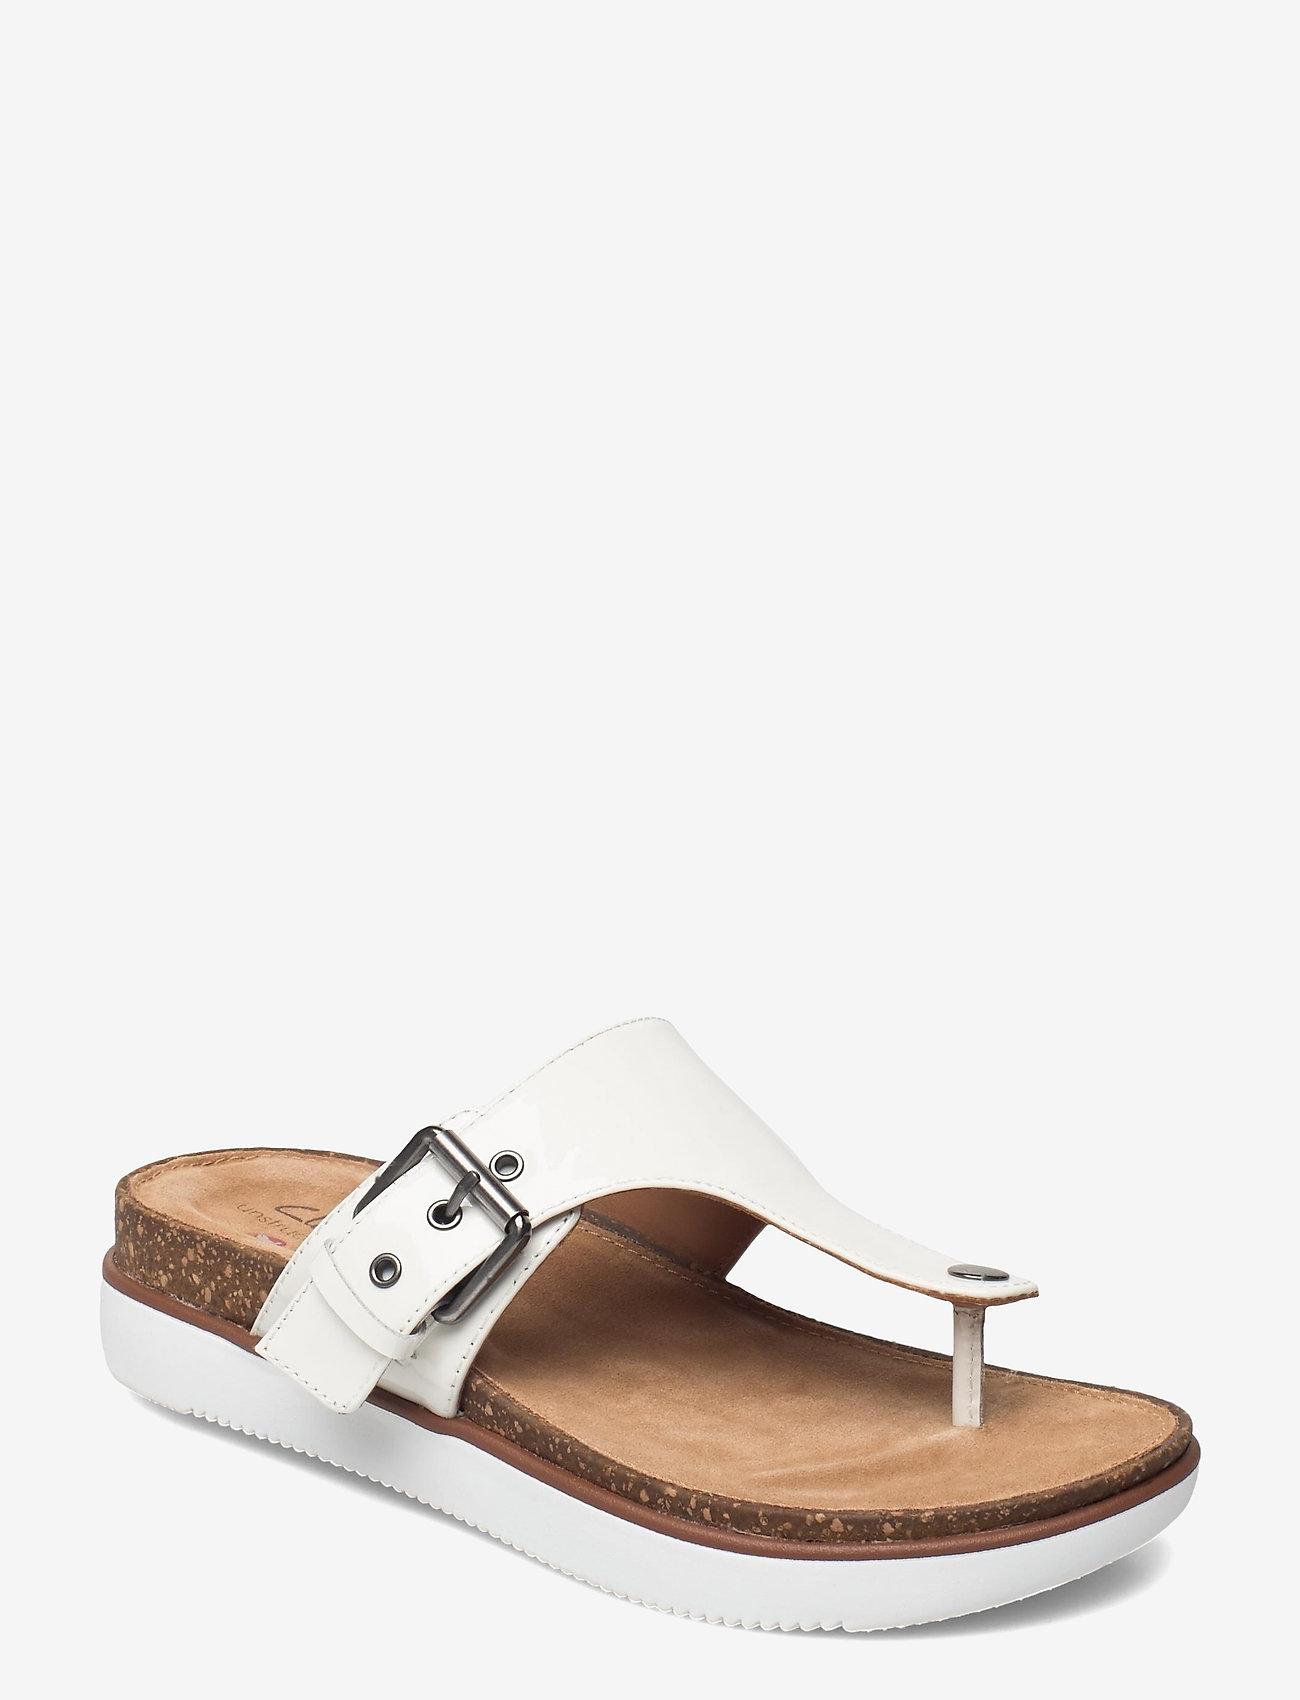 Clarks - Elayne Step - platta sandaler - white patent - 1